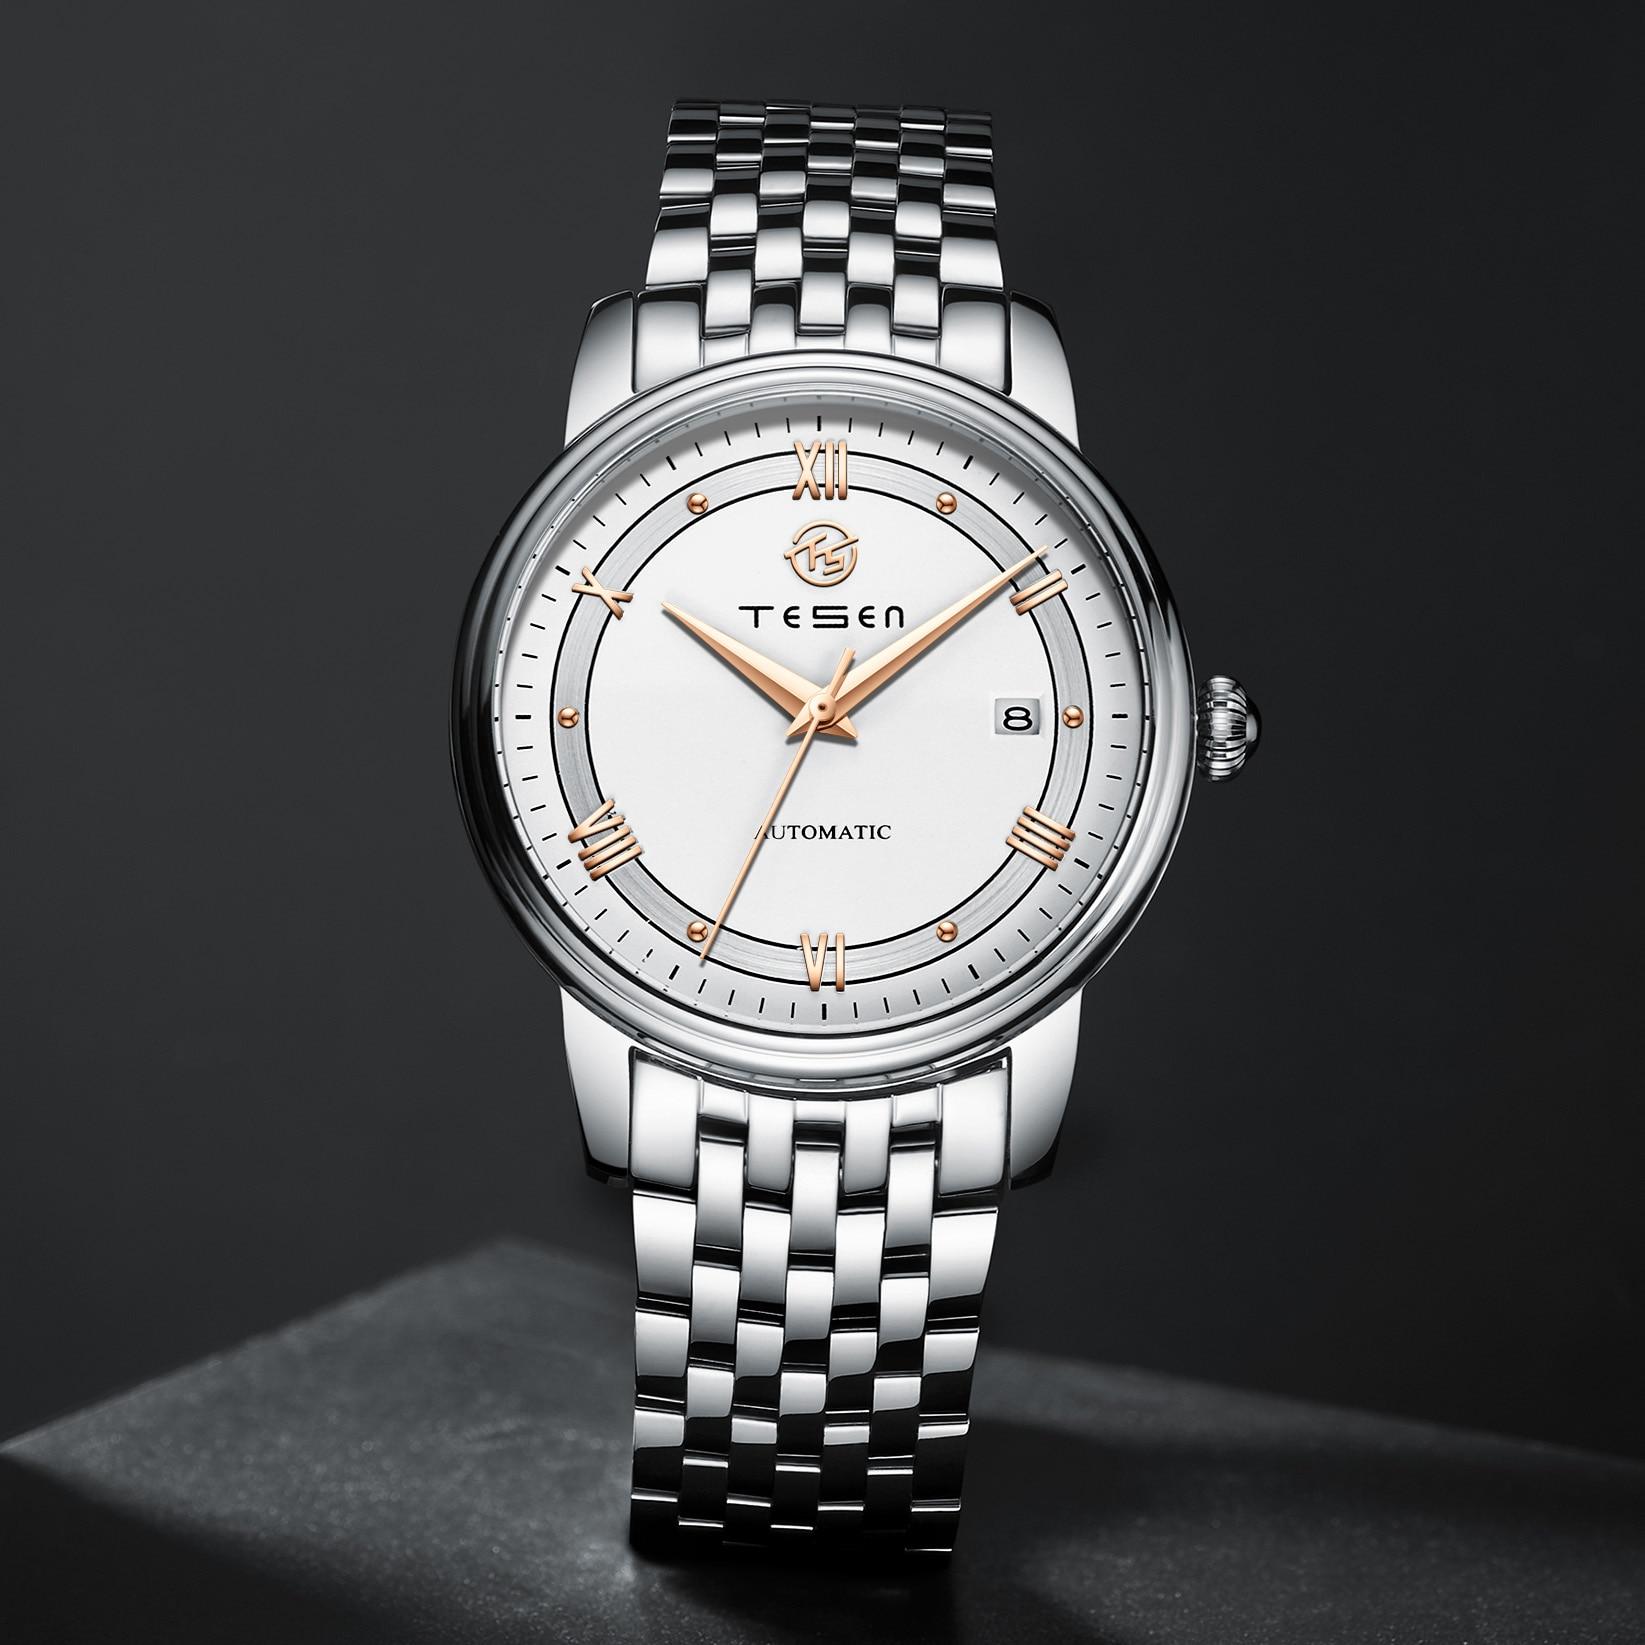 TESEN العلامة التجارية الفاخرة الرجال ساعات أوتوماتيكية التلقائي الميكانيكية 50 متر مقاوم للماء الأعمال عادية الفولاذ المقاوم للصدأ ساعة اليد